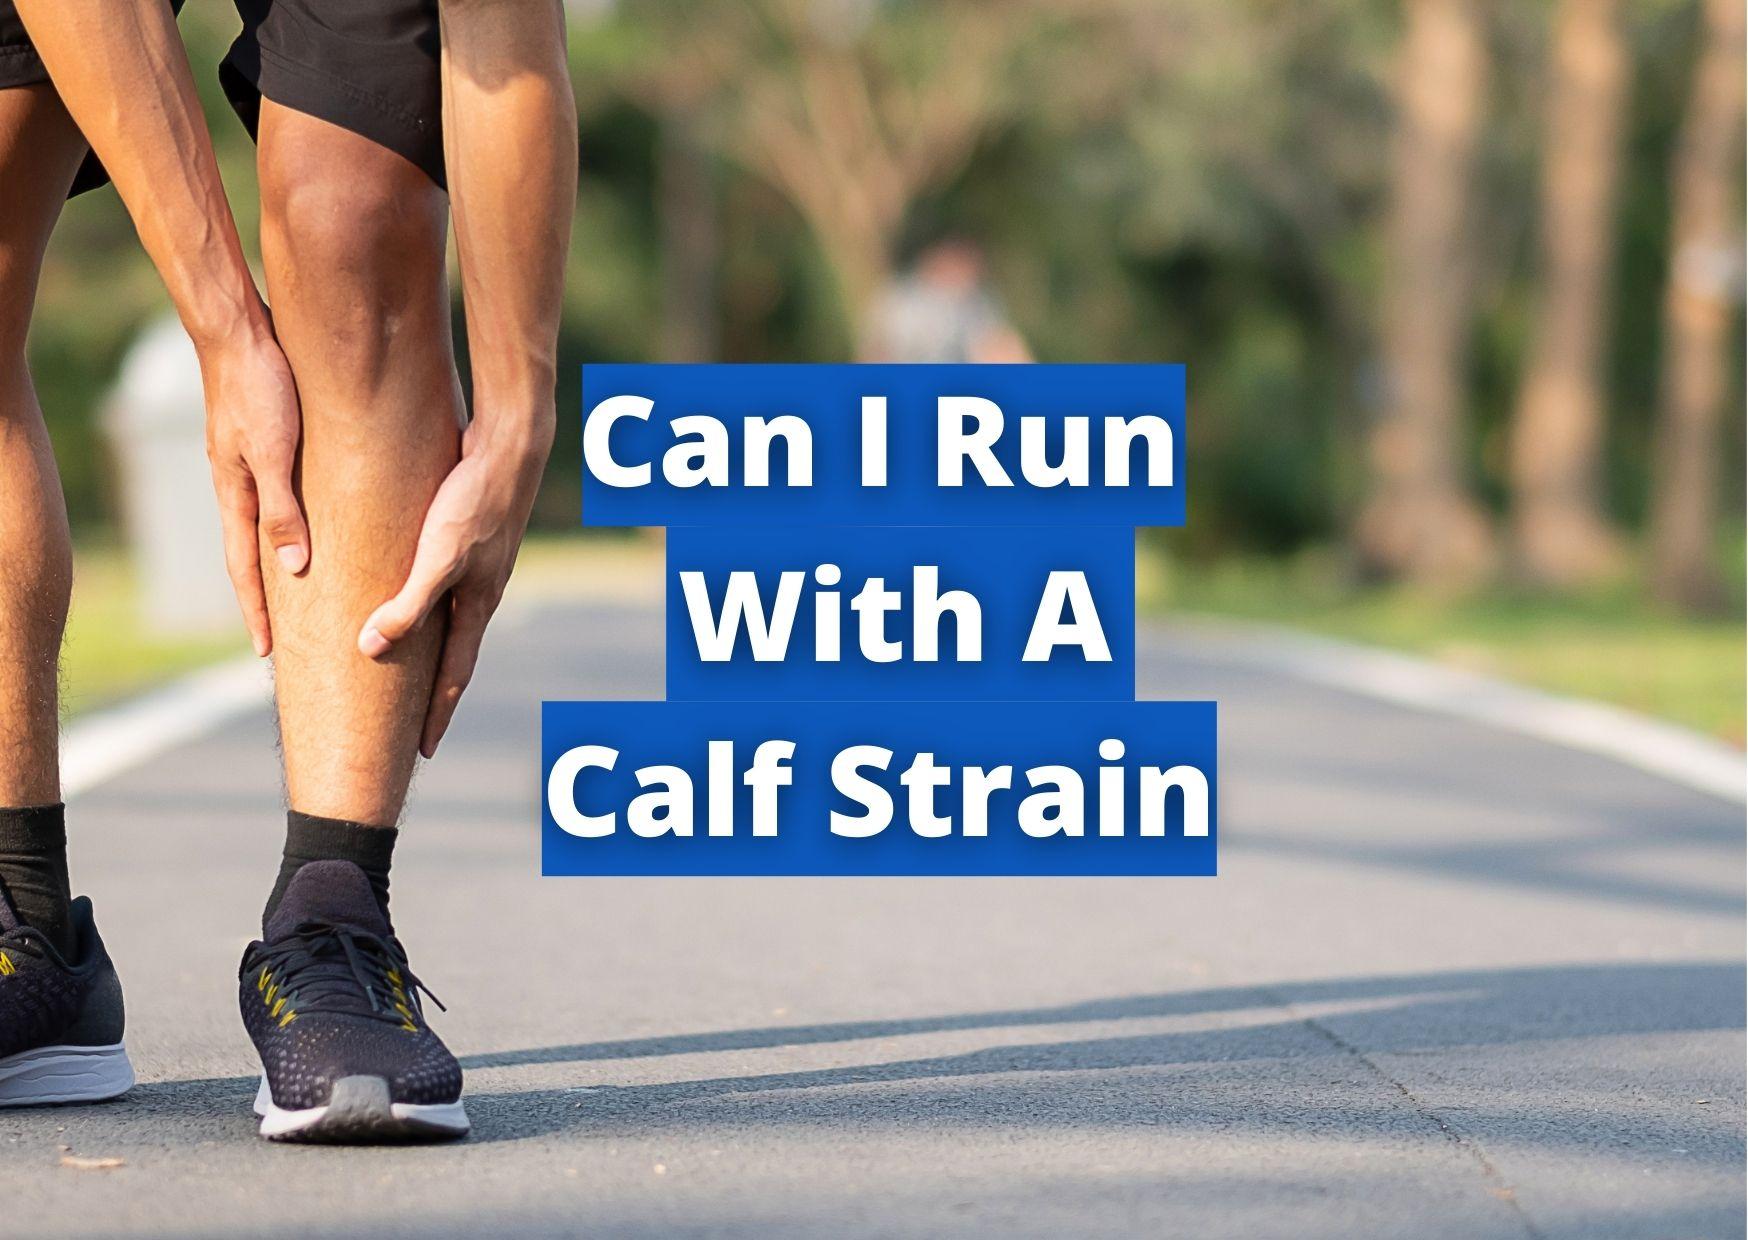 Can I run with a calf strain